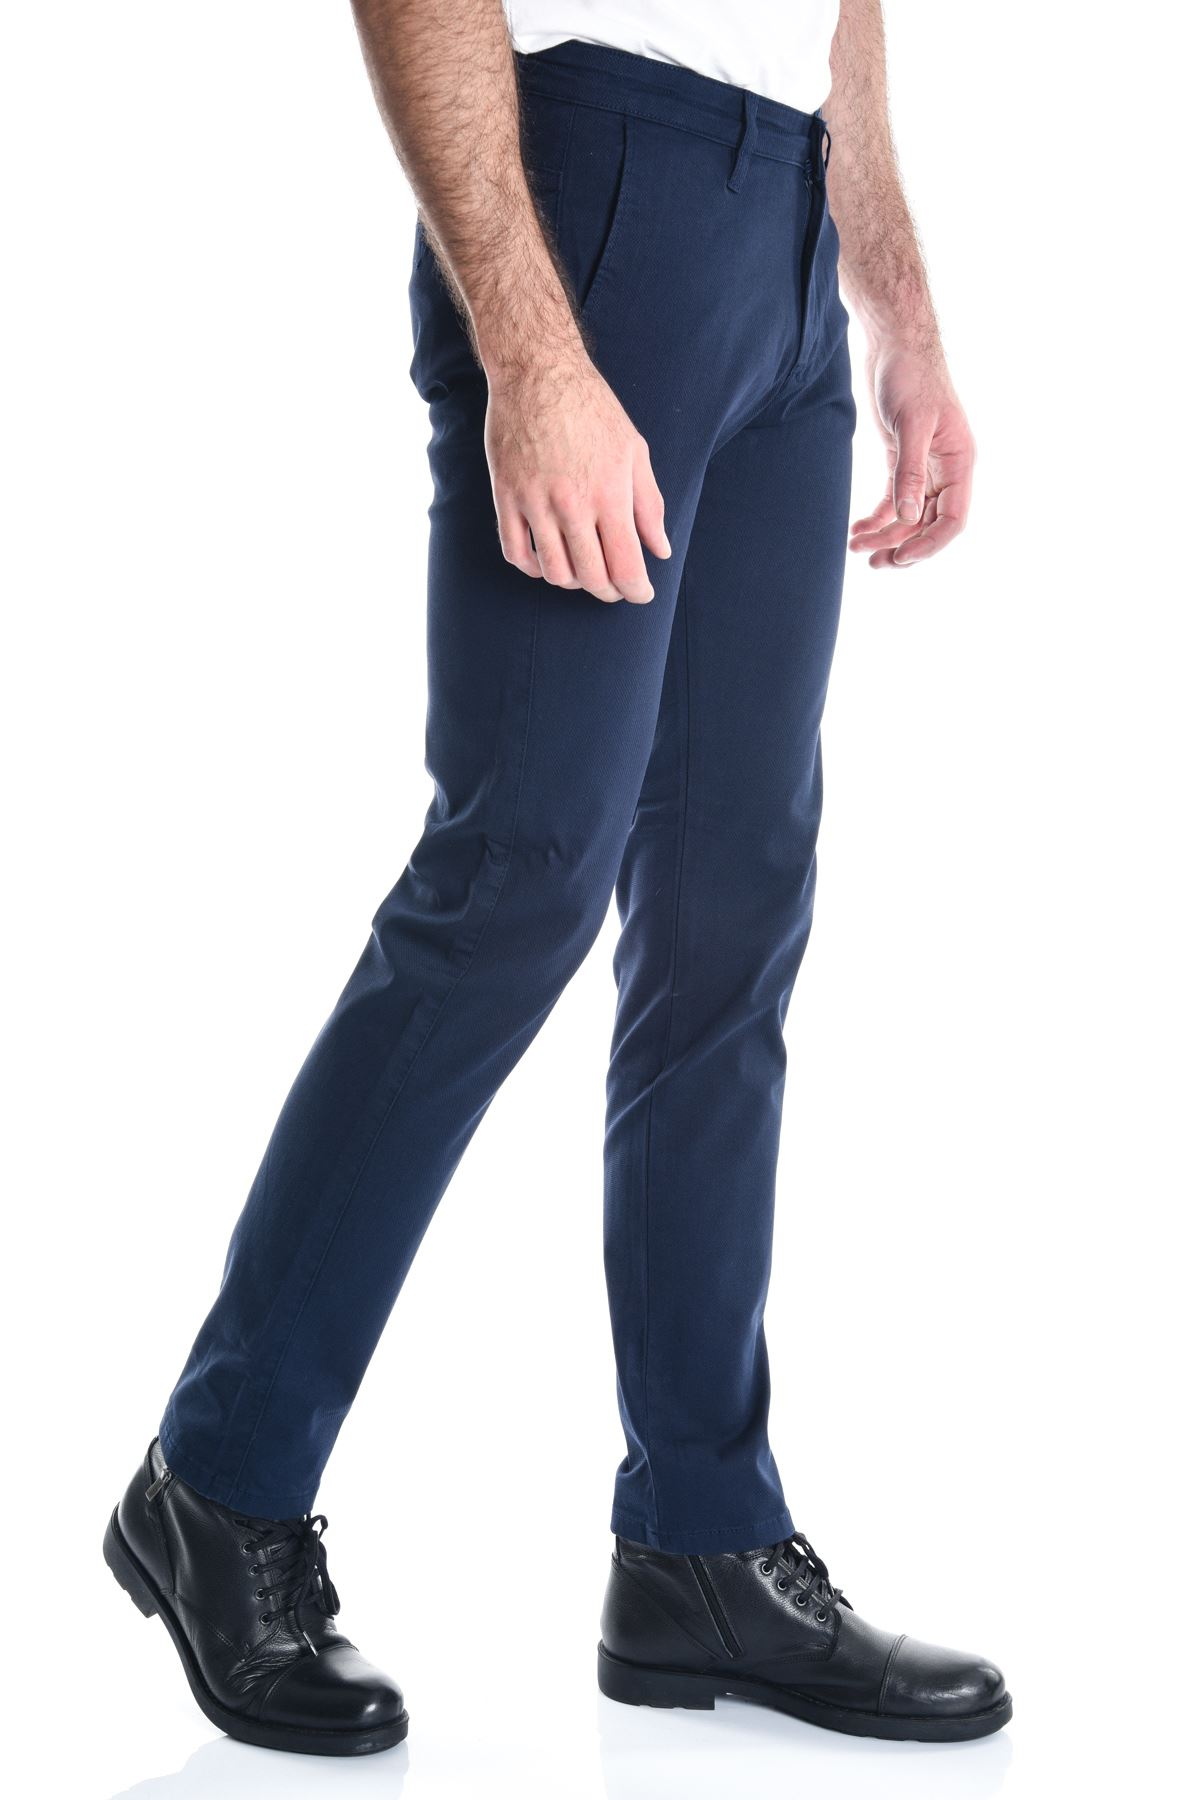 Açık Lacivert Erkek Chino Pantolon